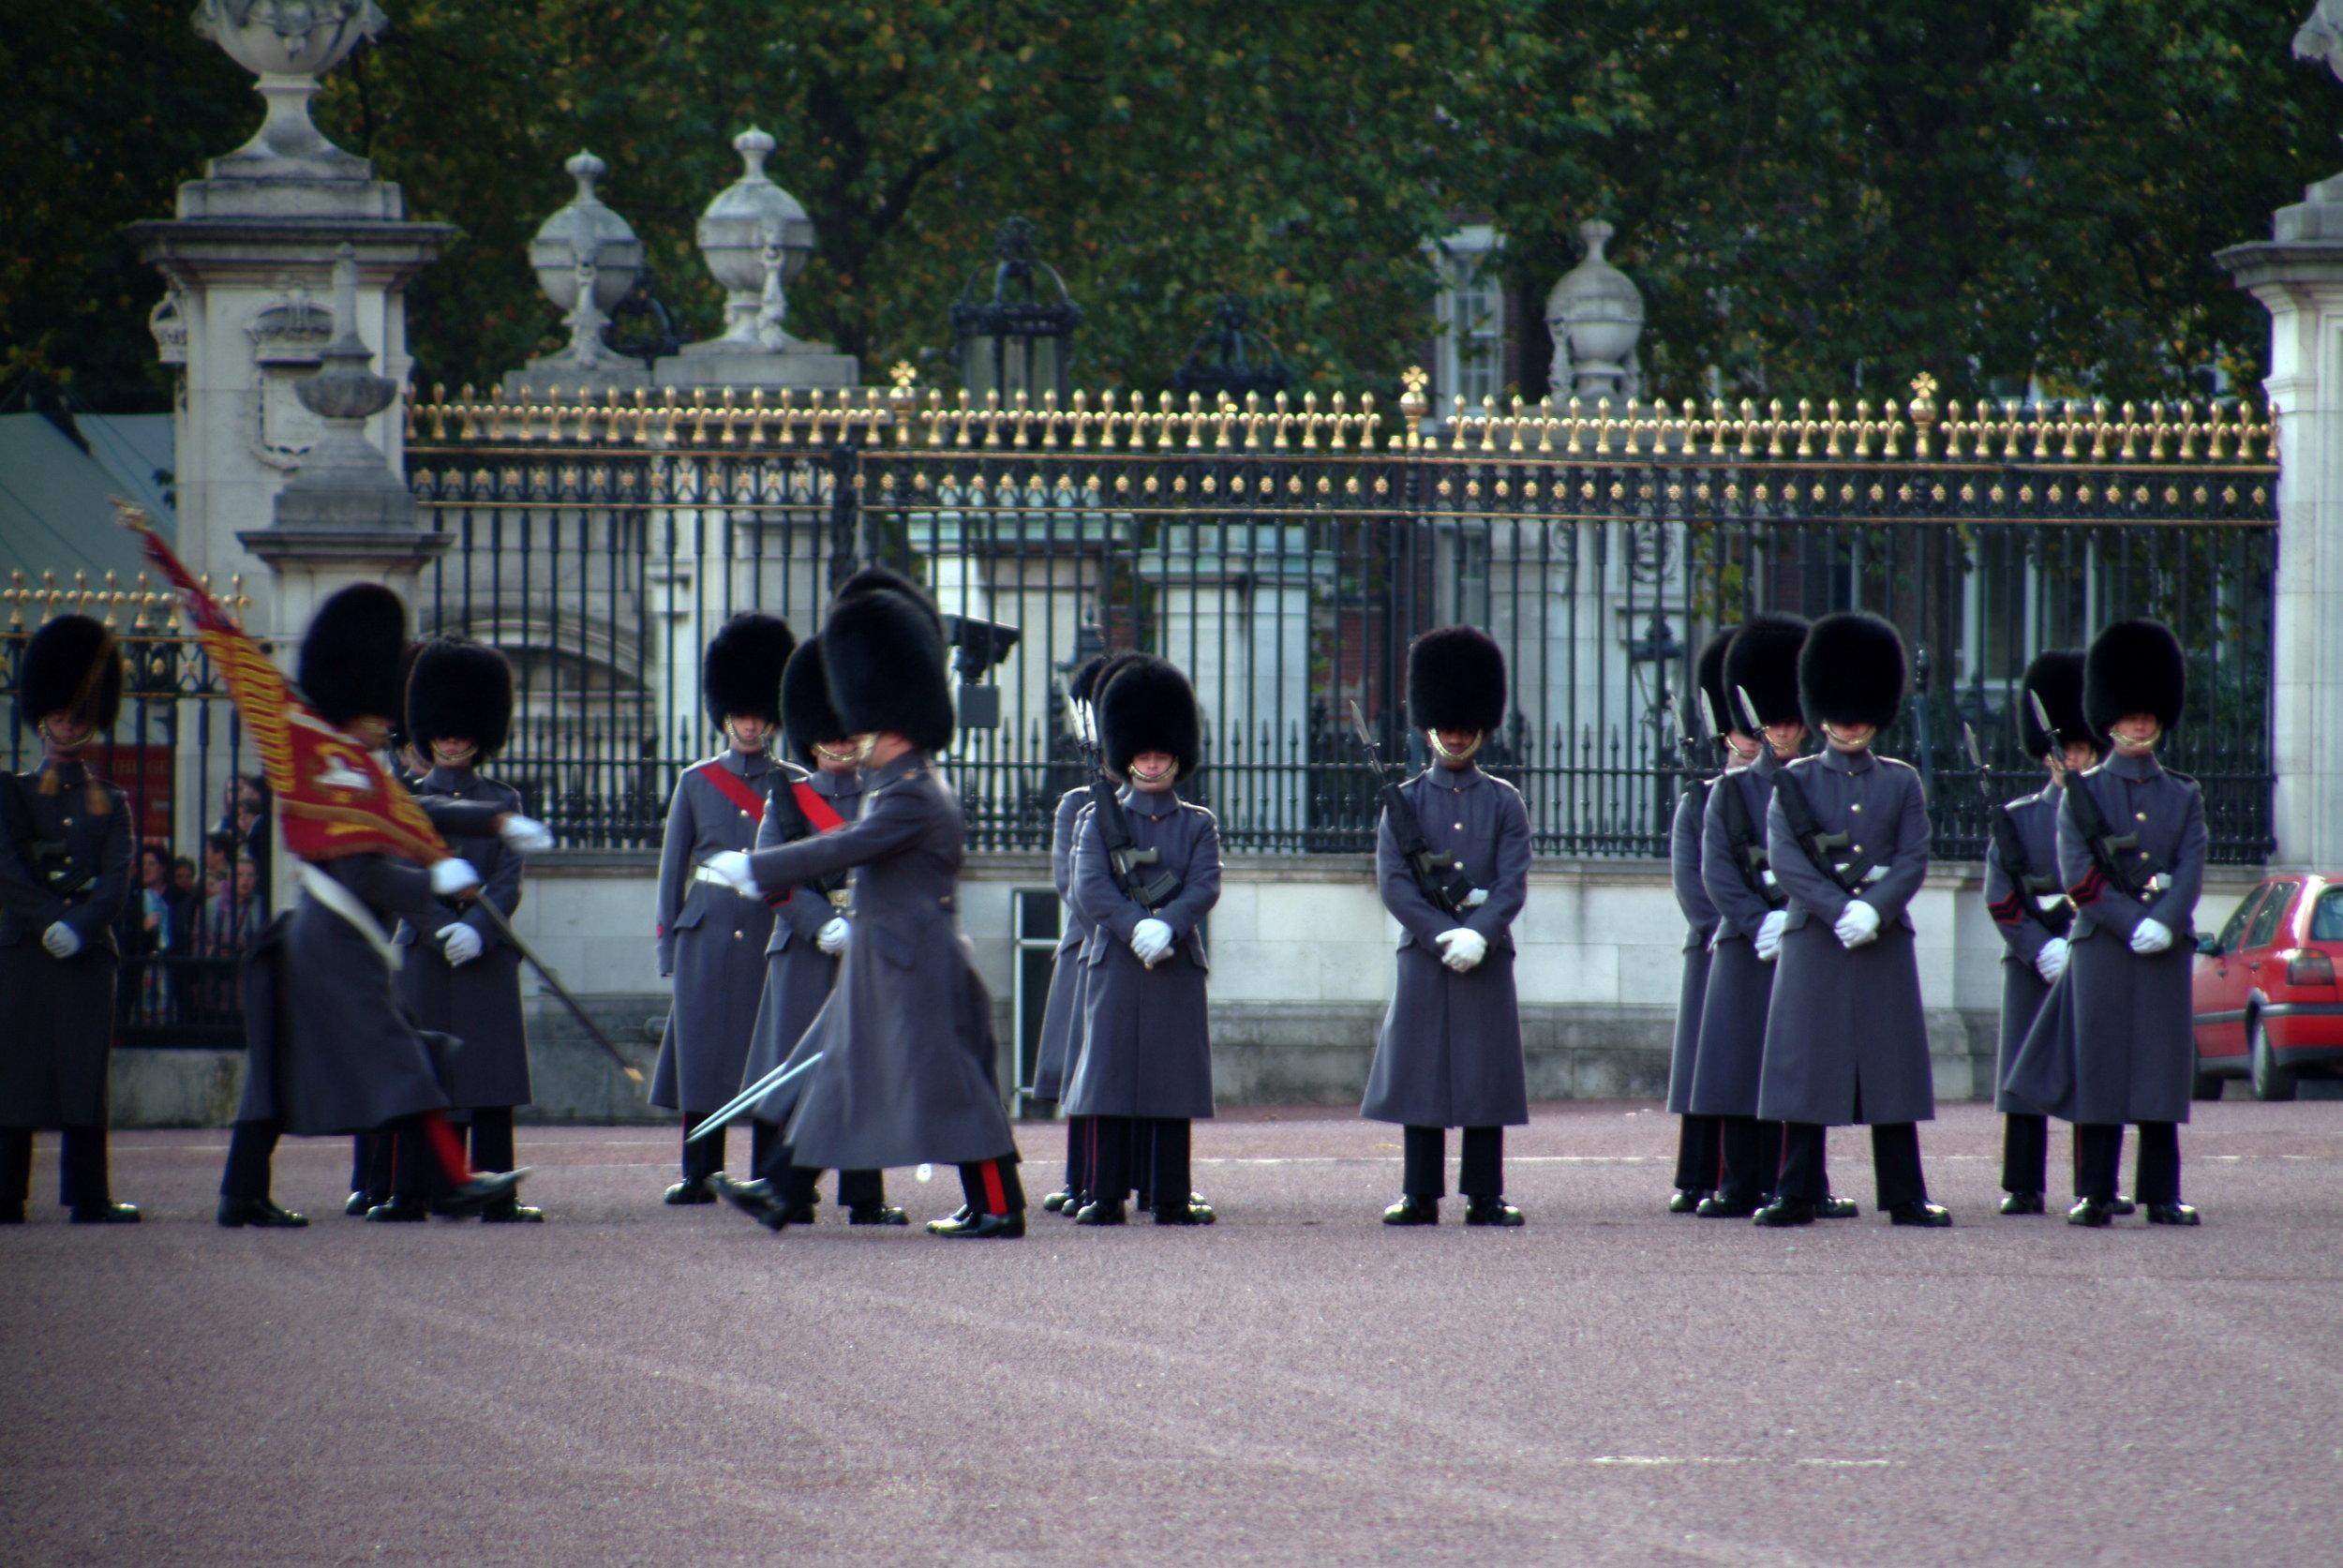 Buckingham Palace Changing the Guard